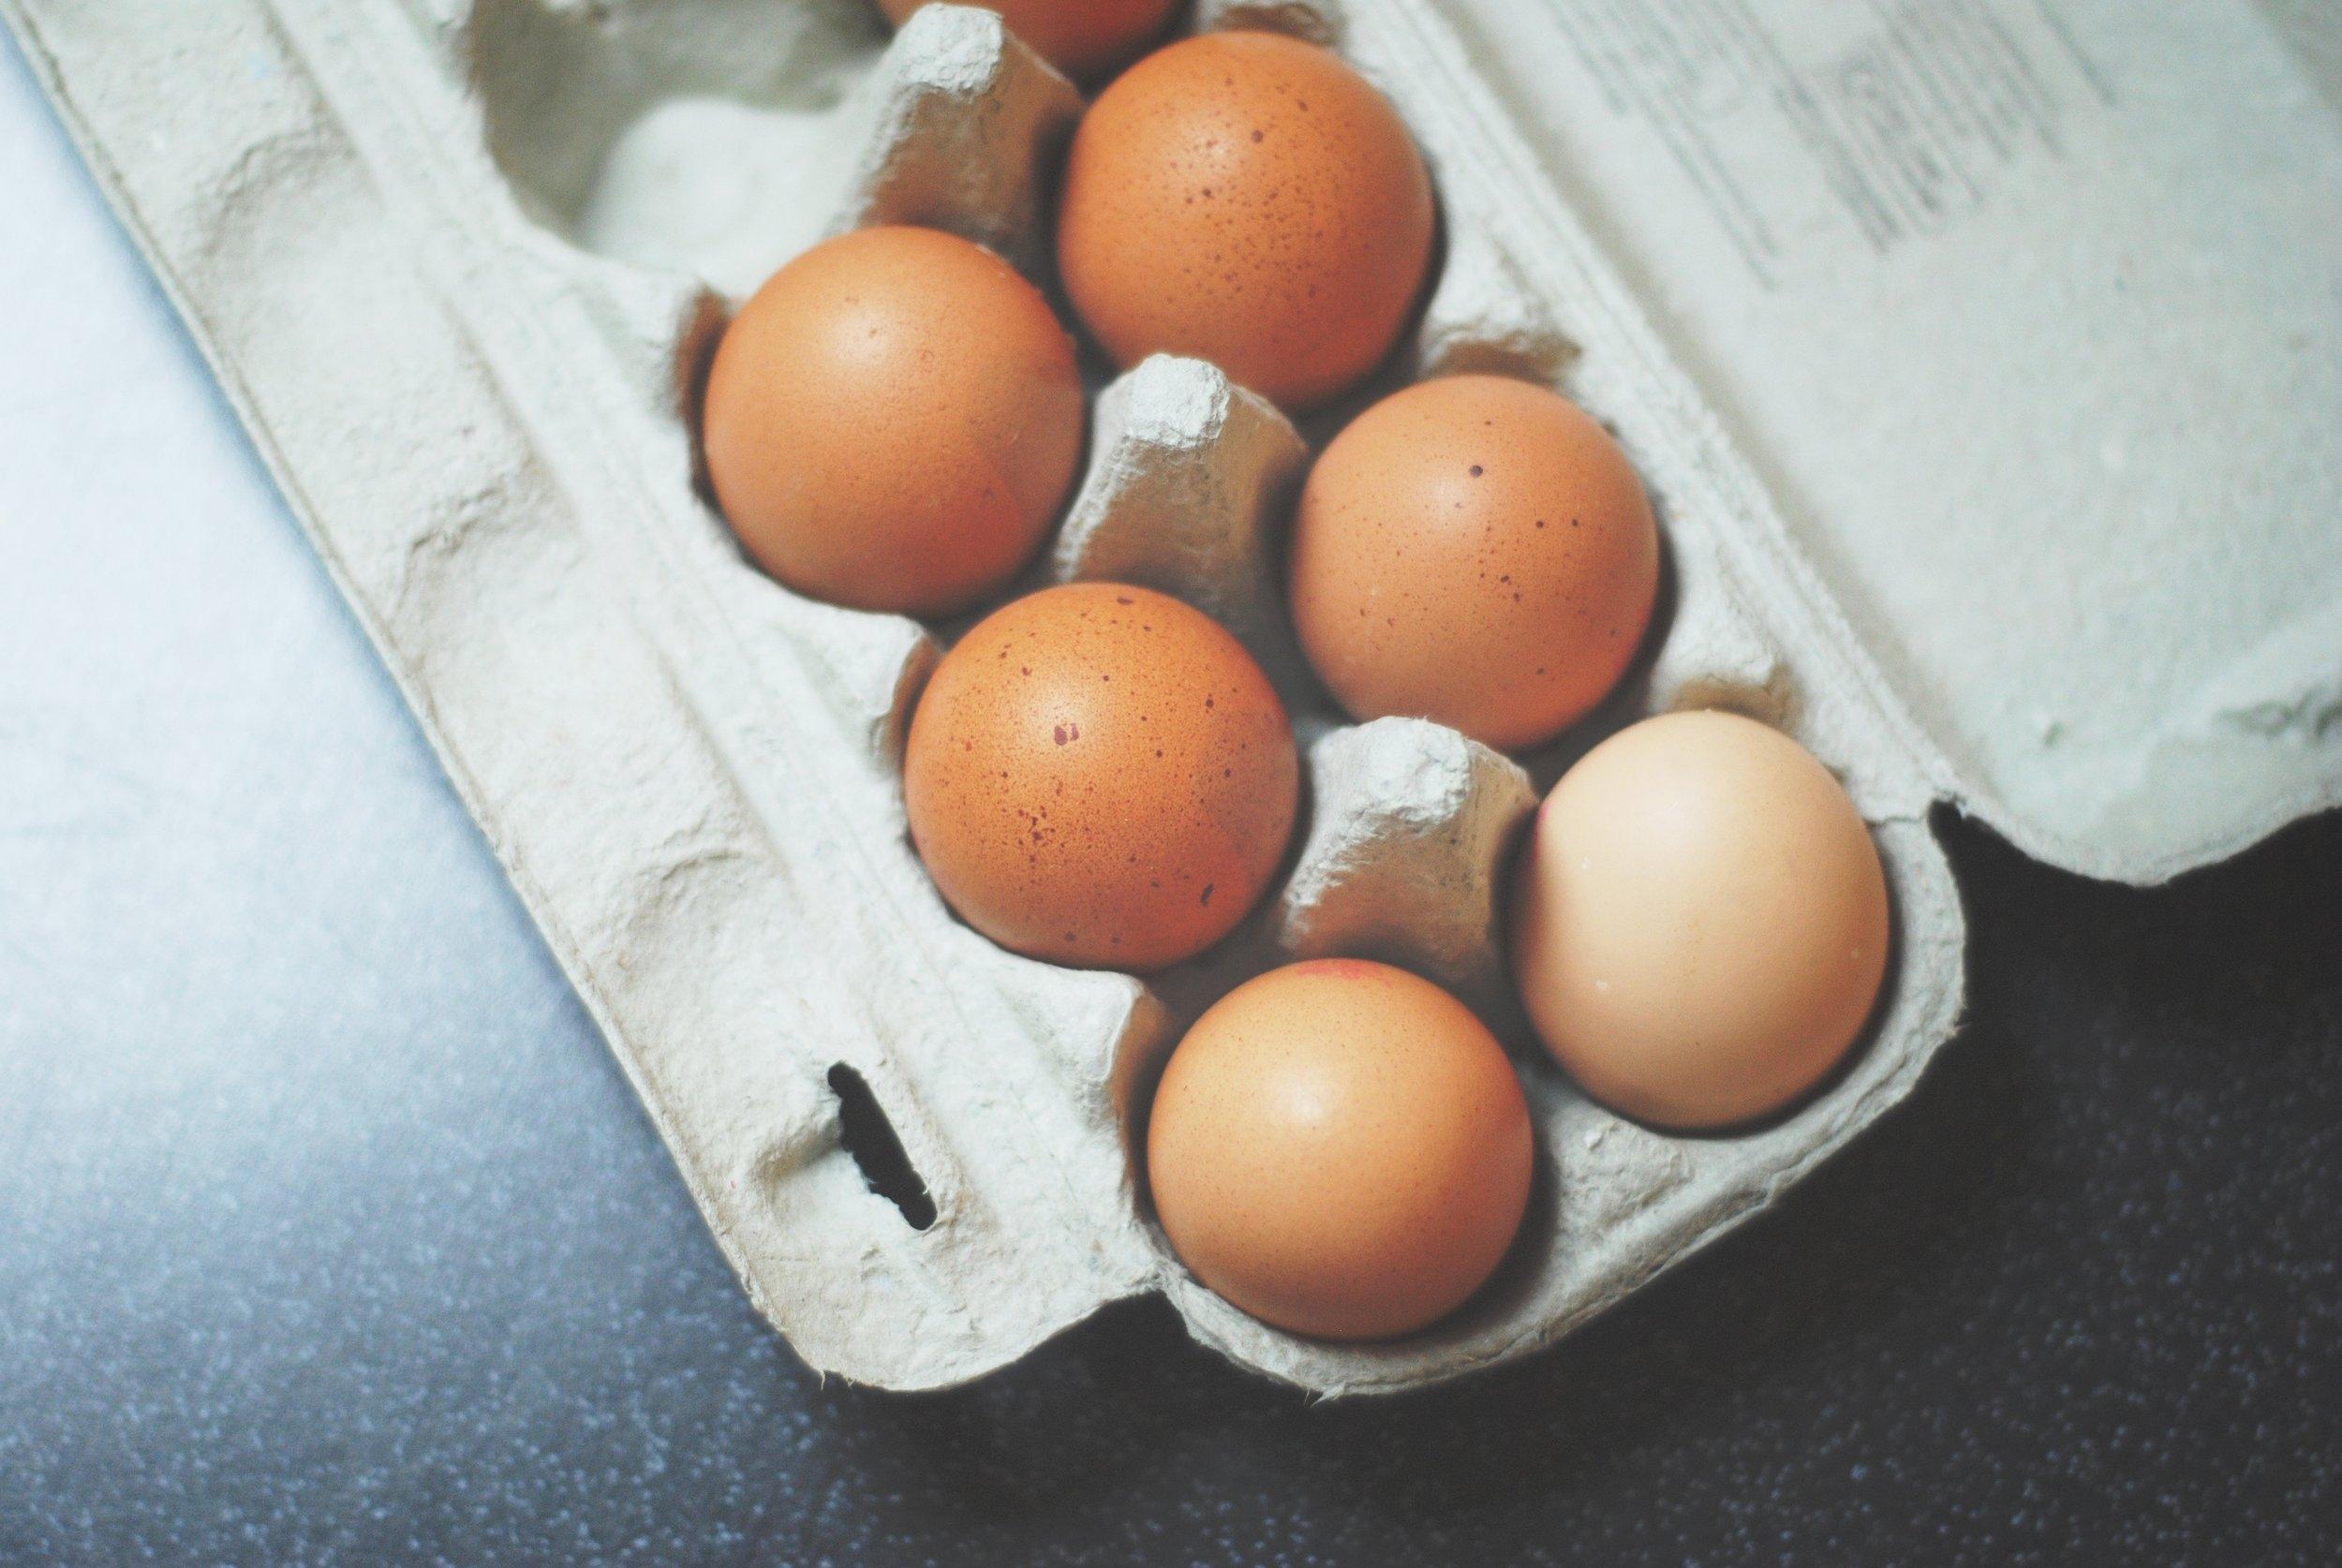 1 dozen free range eggs- $4.75